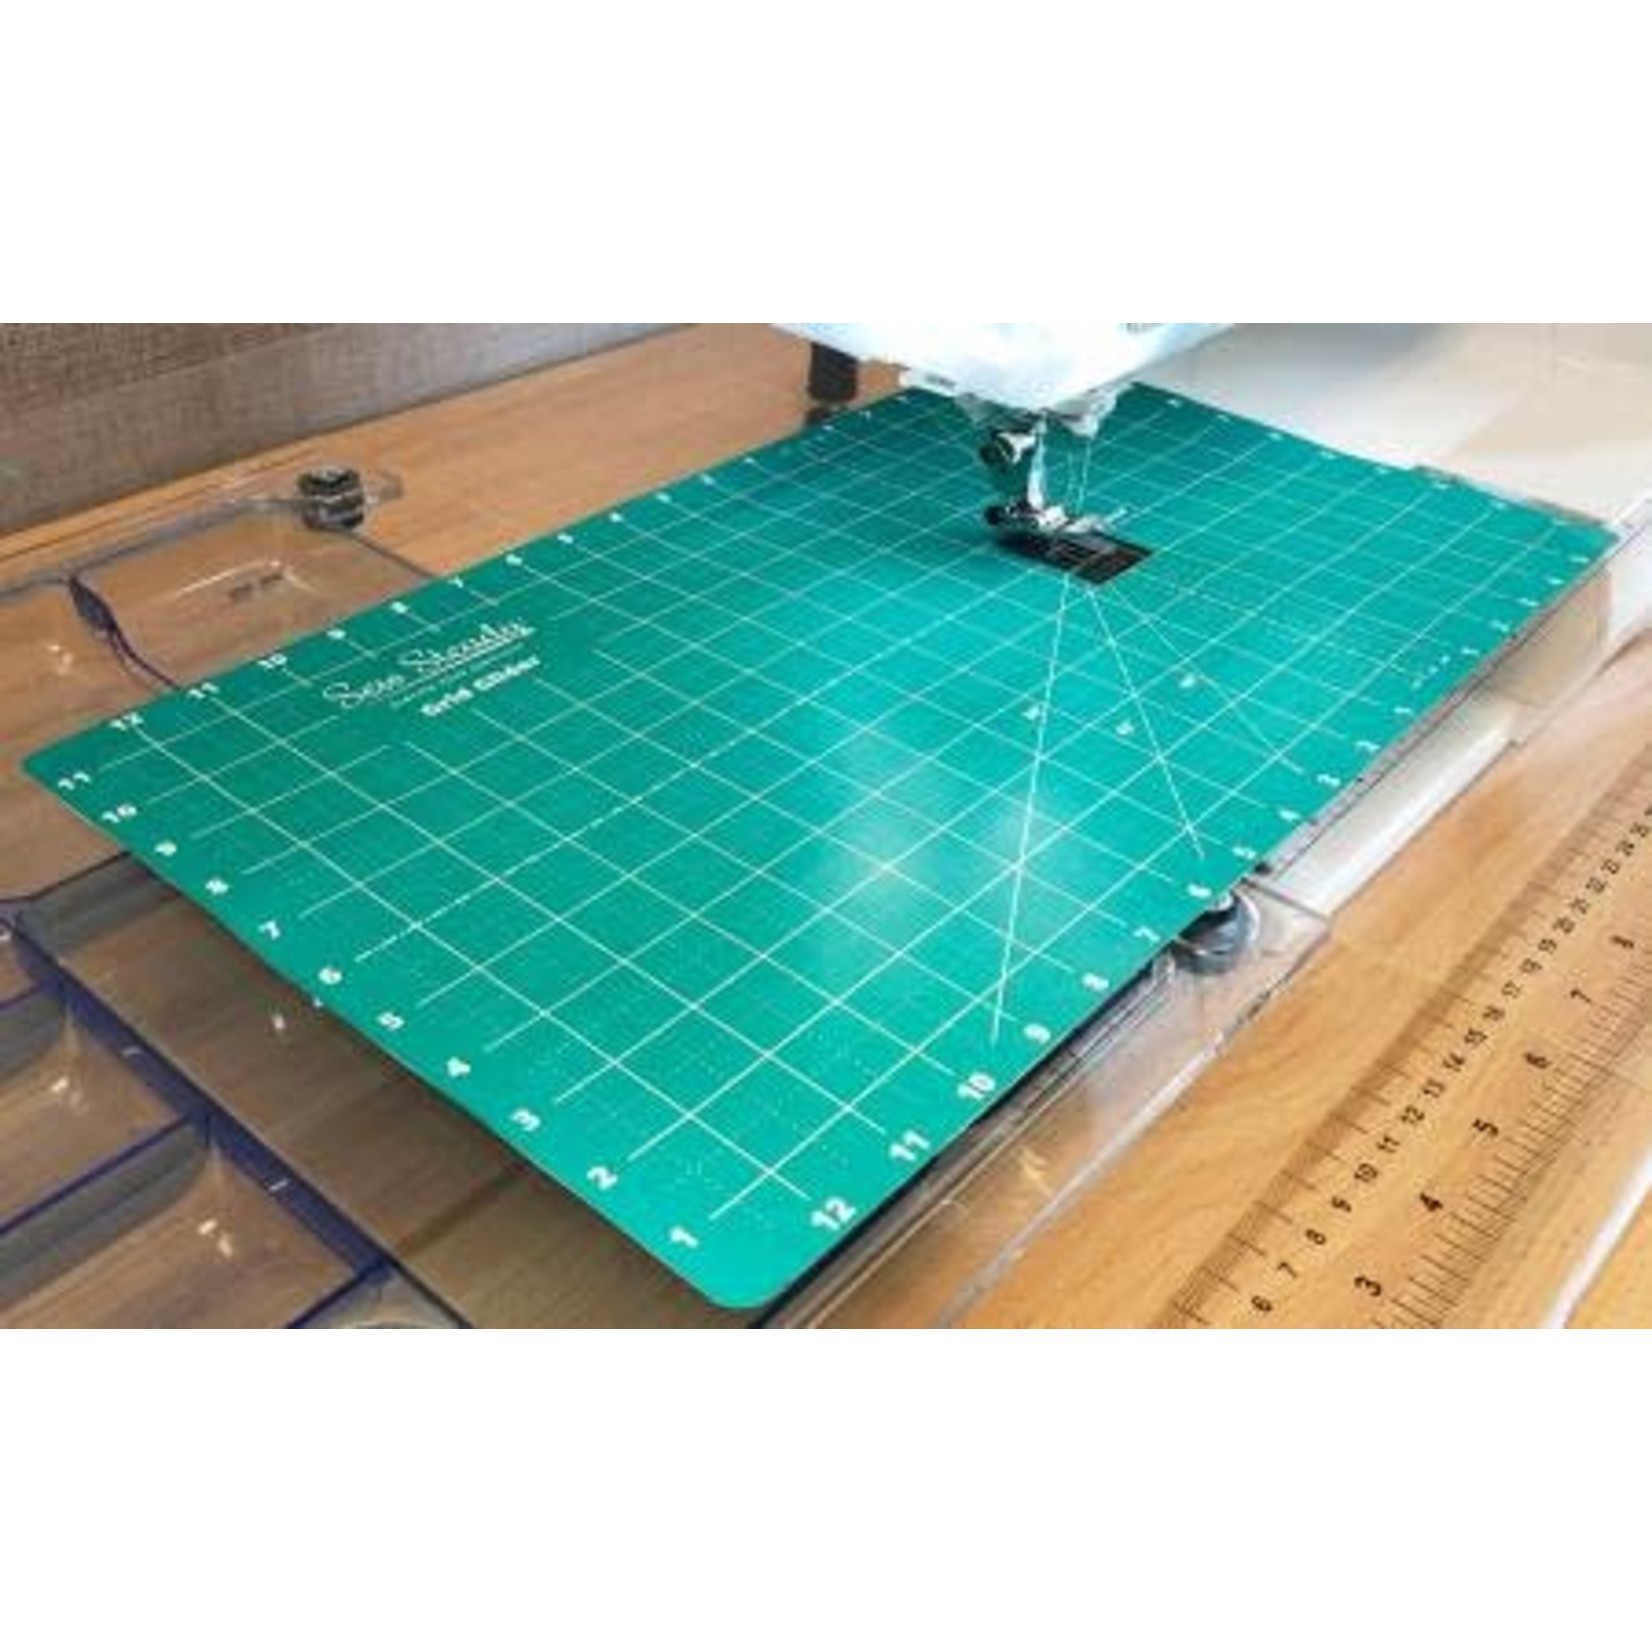 Sew Steady Glijmat - Grid Glider - 12 x 20 inch - Groen